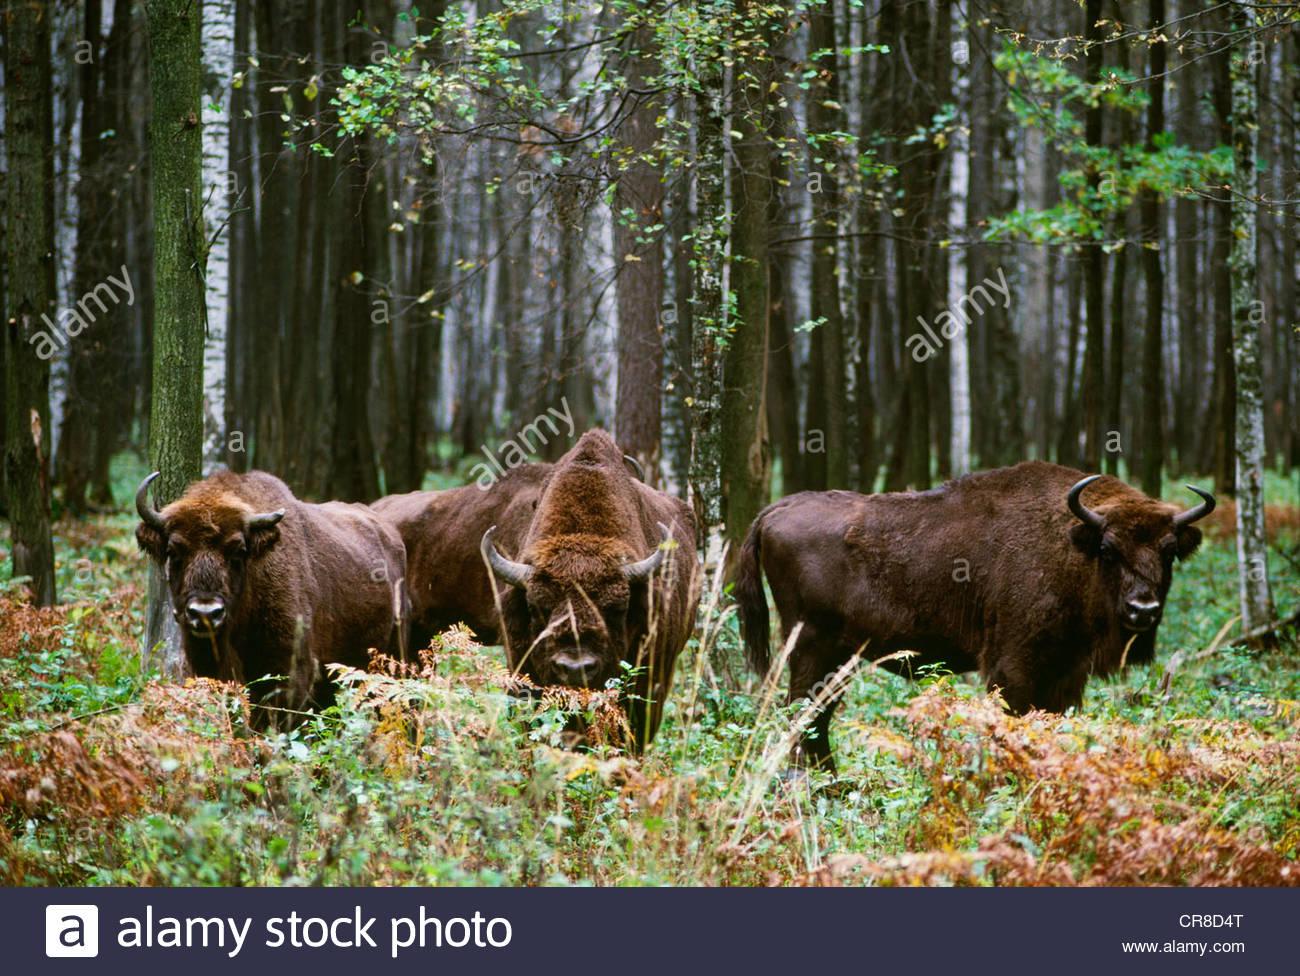 El bisonte europeo, Reserva Prioksko-Terrasnyy, Rusia Imagen De Stock